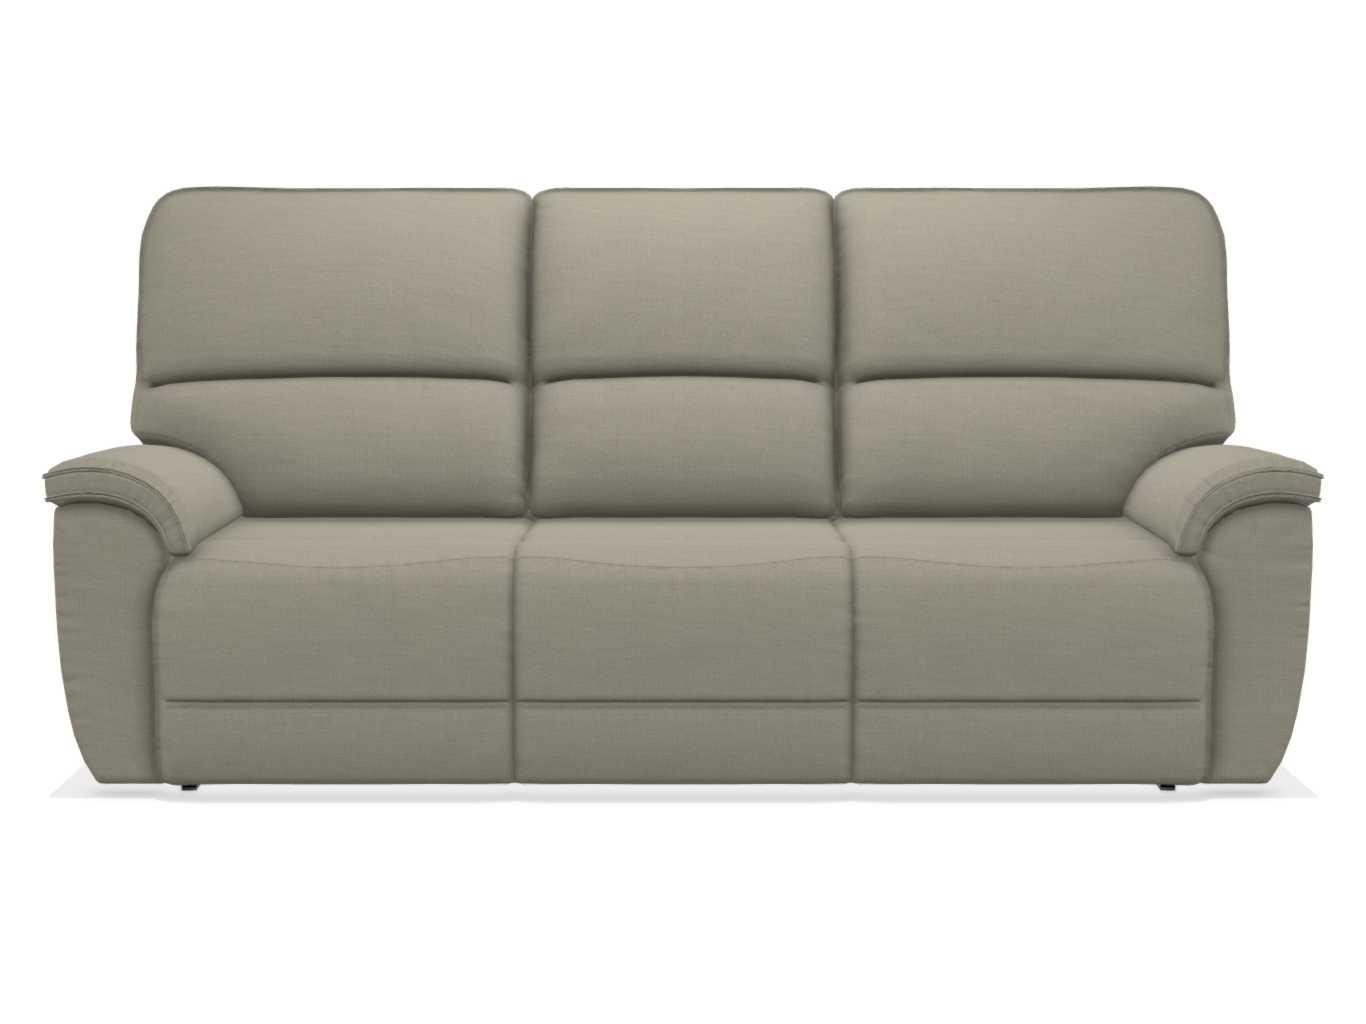 Norris Power Reclining Sofa w/ Headrest